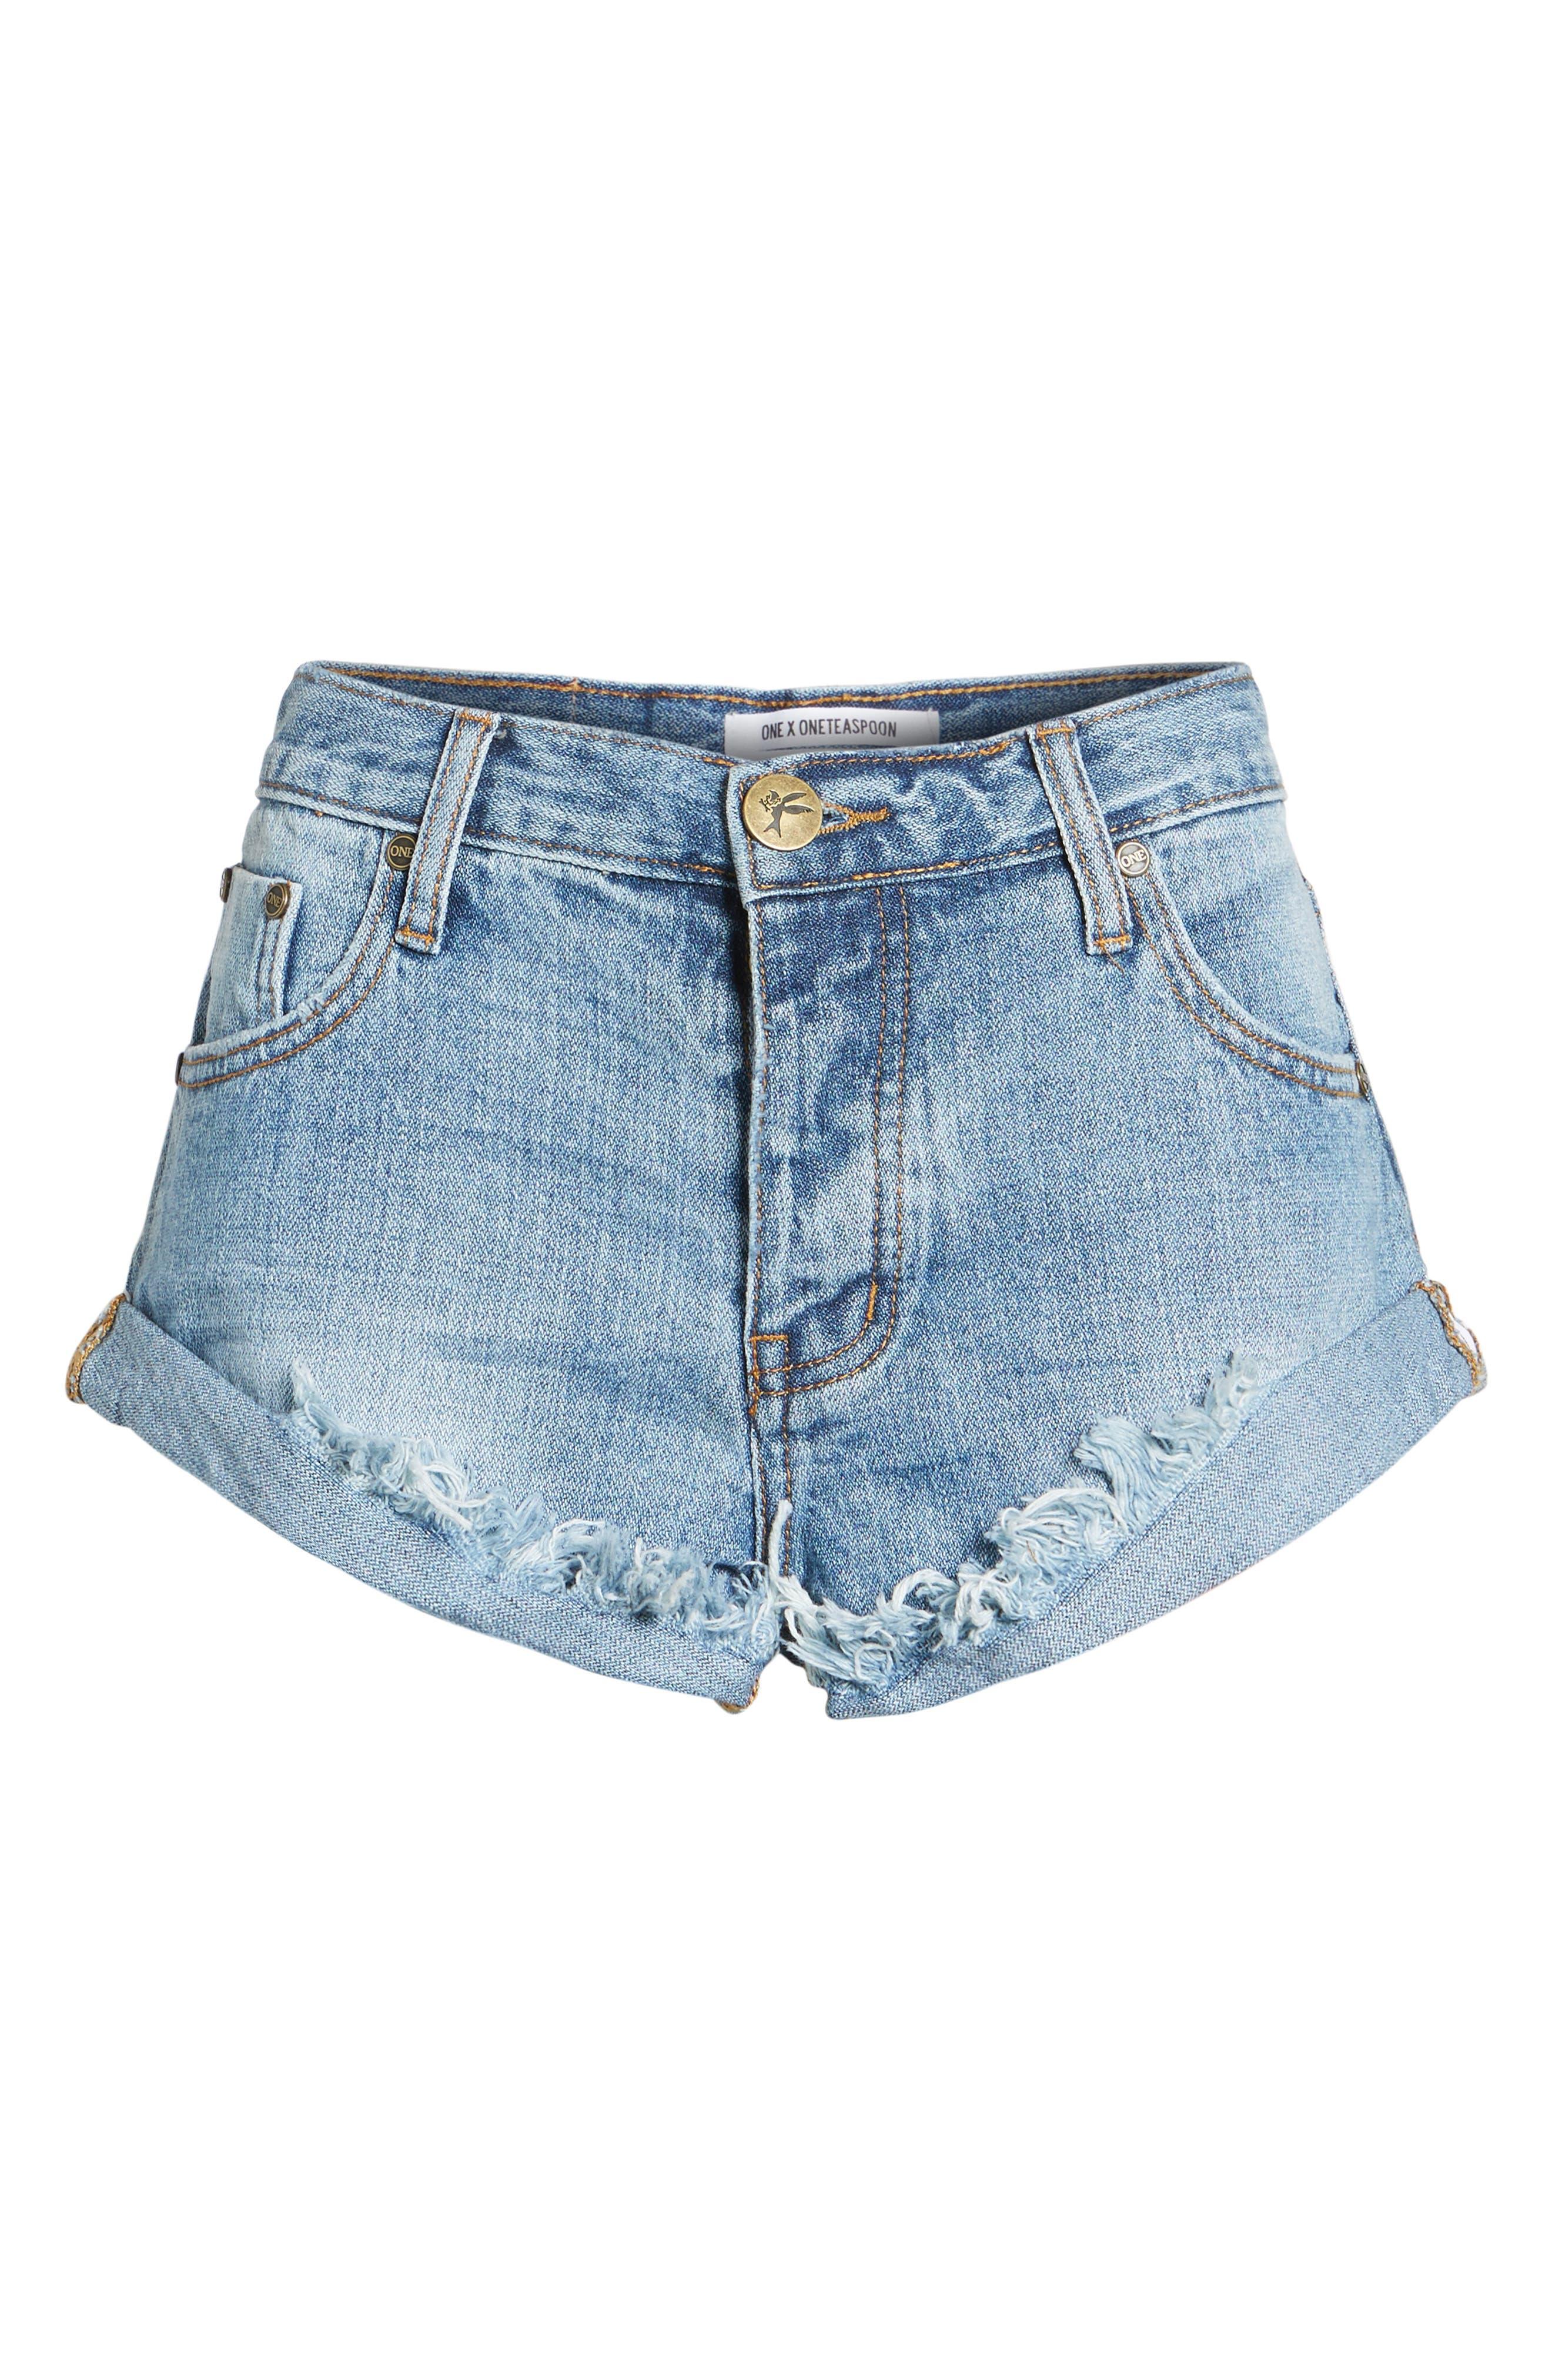 Bandits Denim Shorts,                             Alternate thumbnail 6, color,                             460